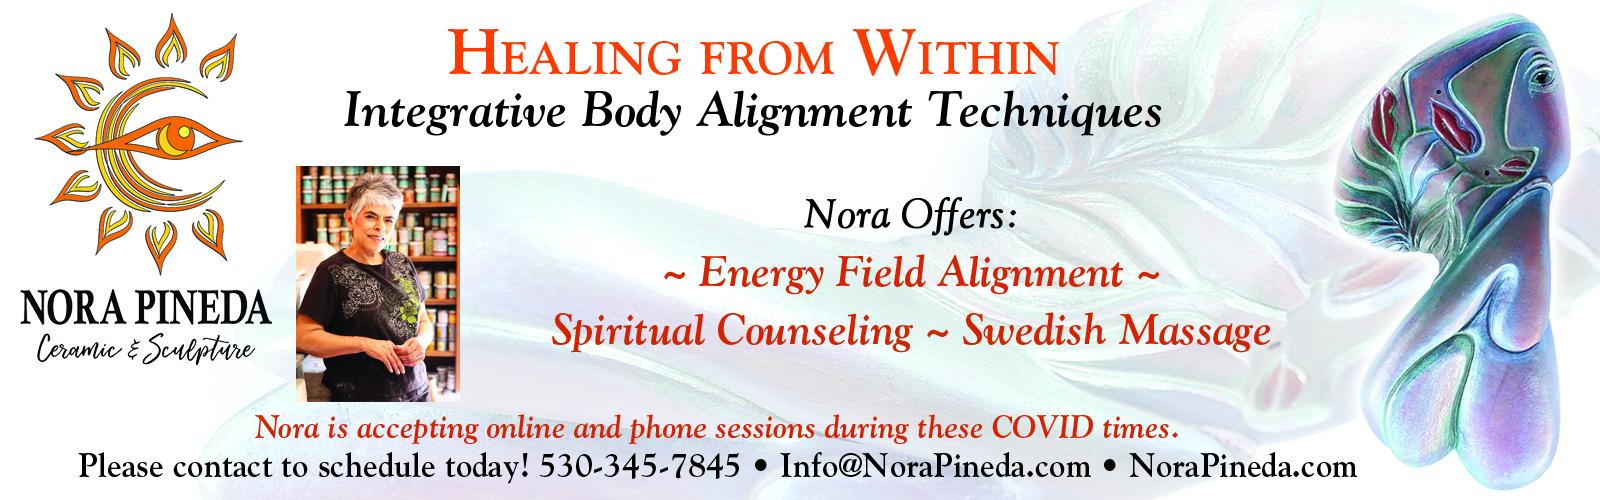 Nora Pineda Healing